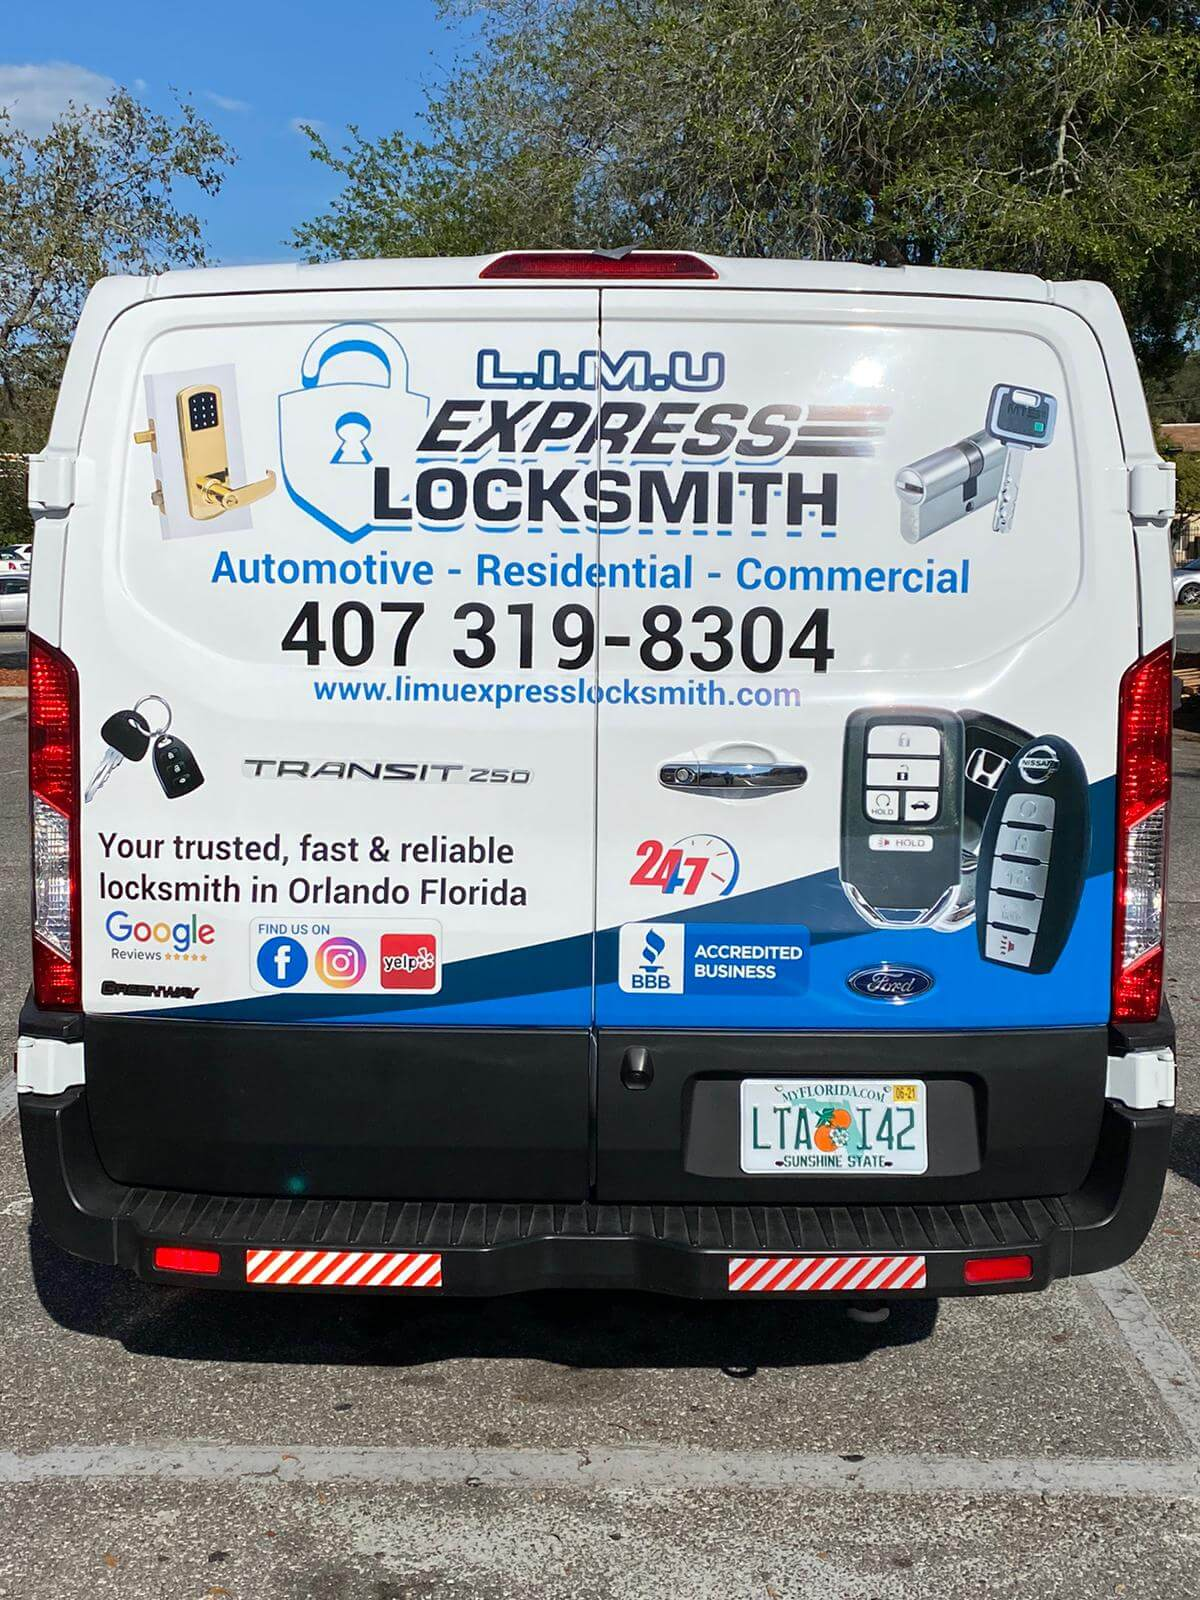 LIMU express locksmith Orlando florida